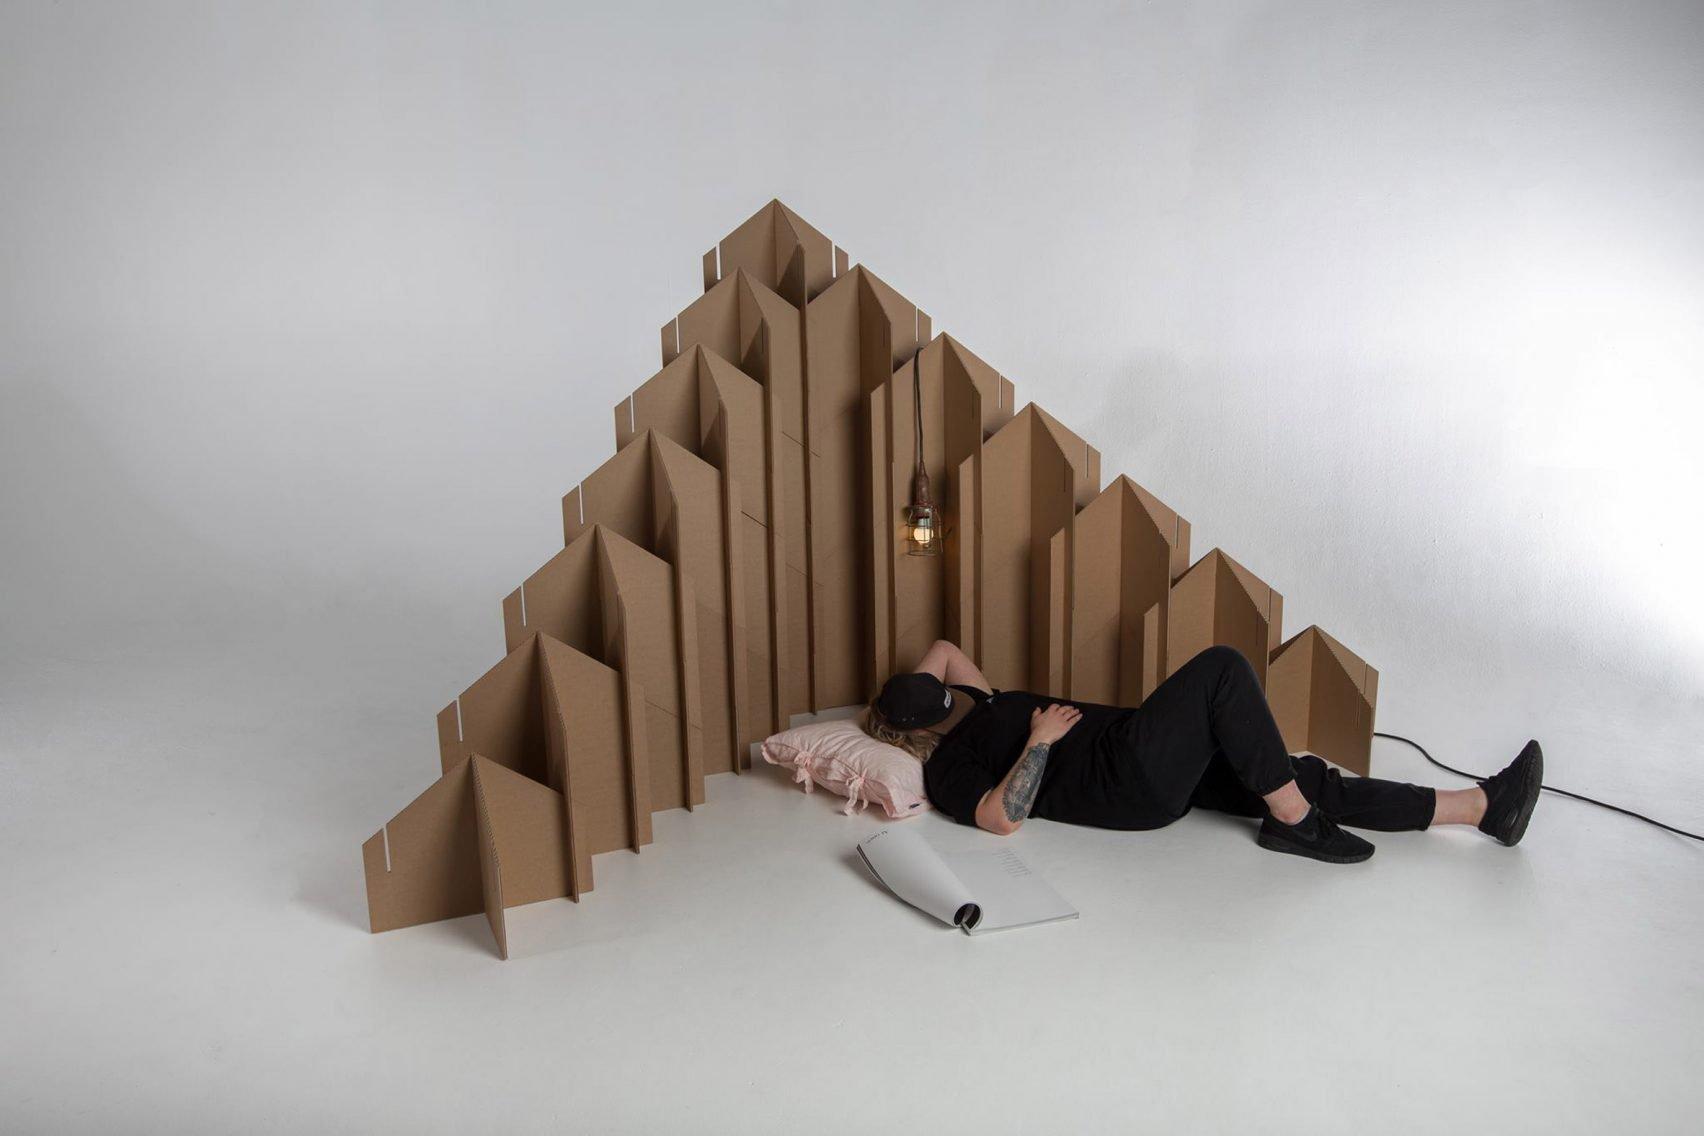 Students design temporary furniture for displaced people | Design Indaba